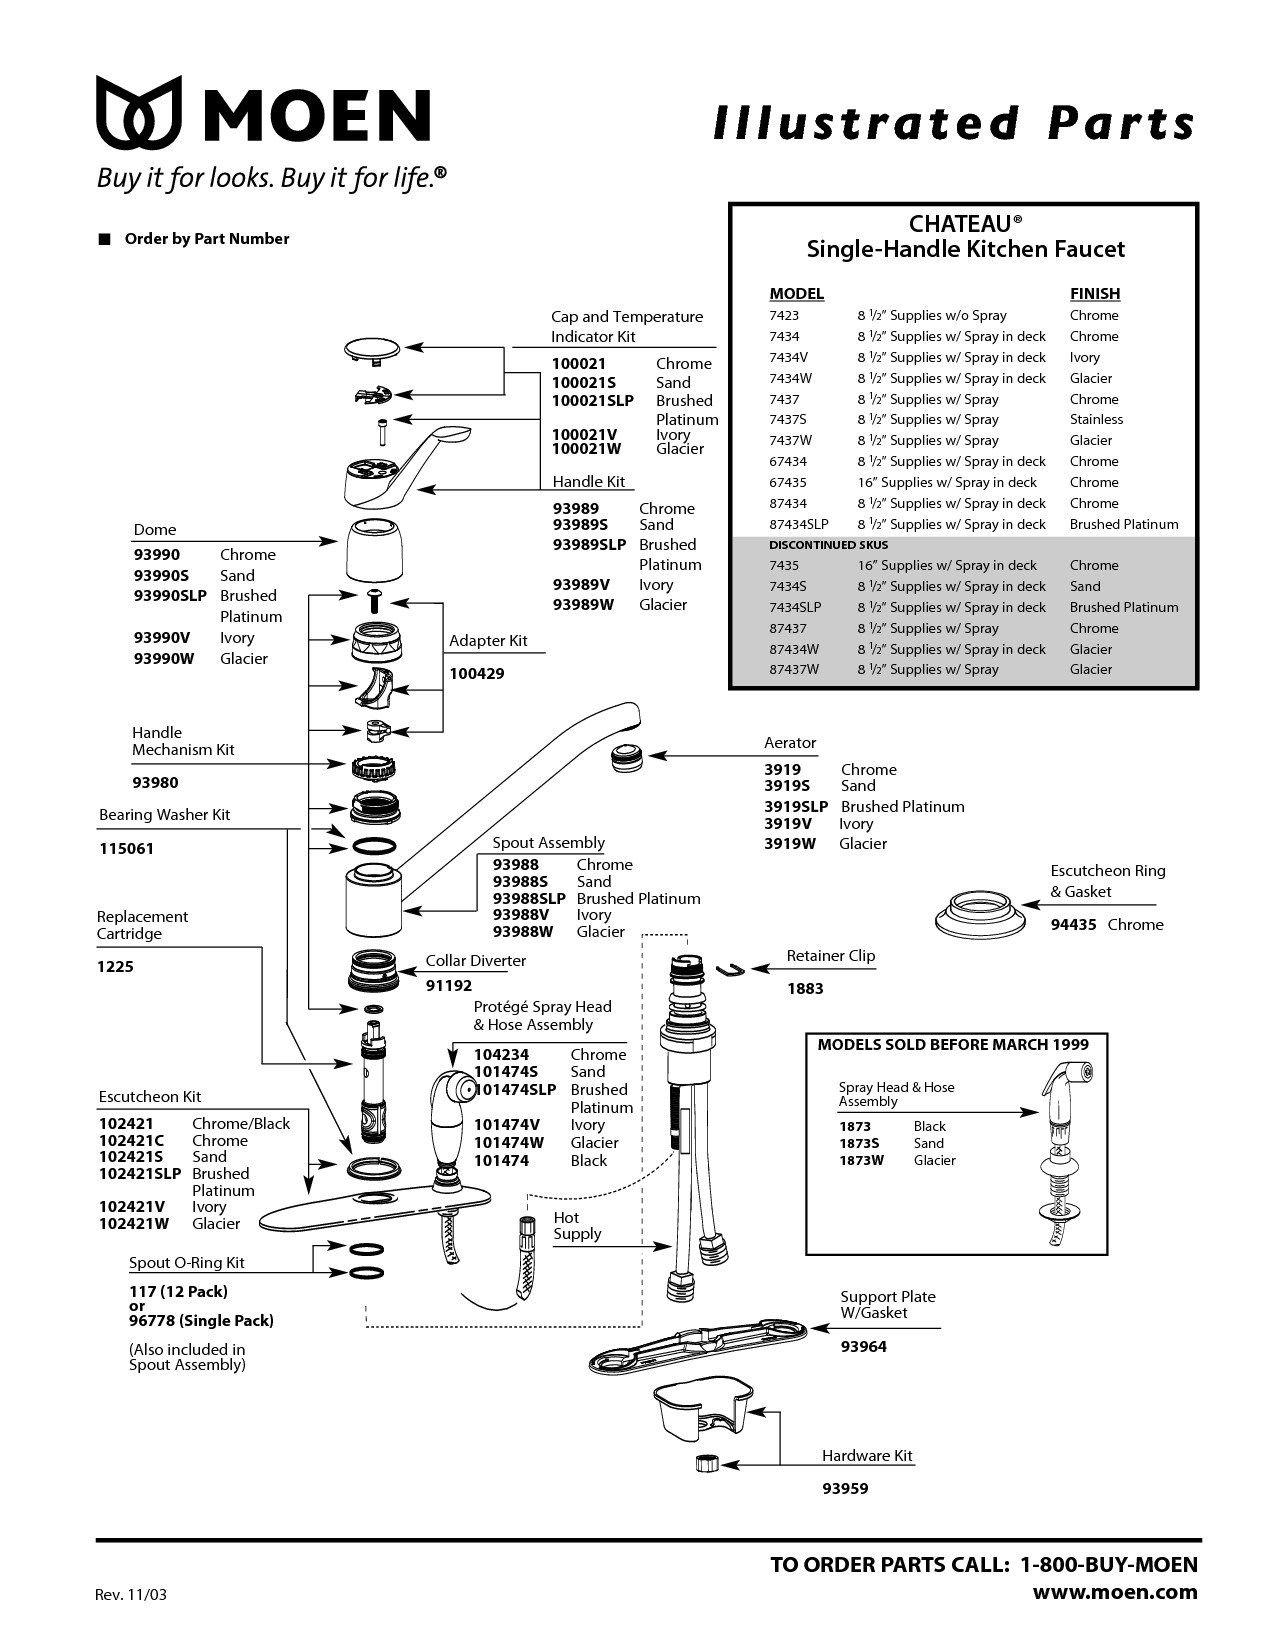 Luxury Moen Faucet 7400 Diagram Check more at https ...